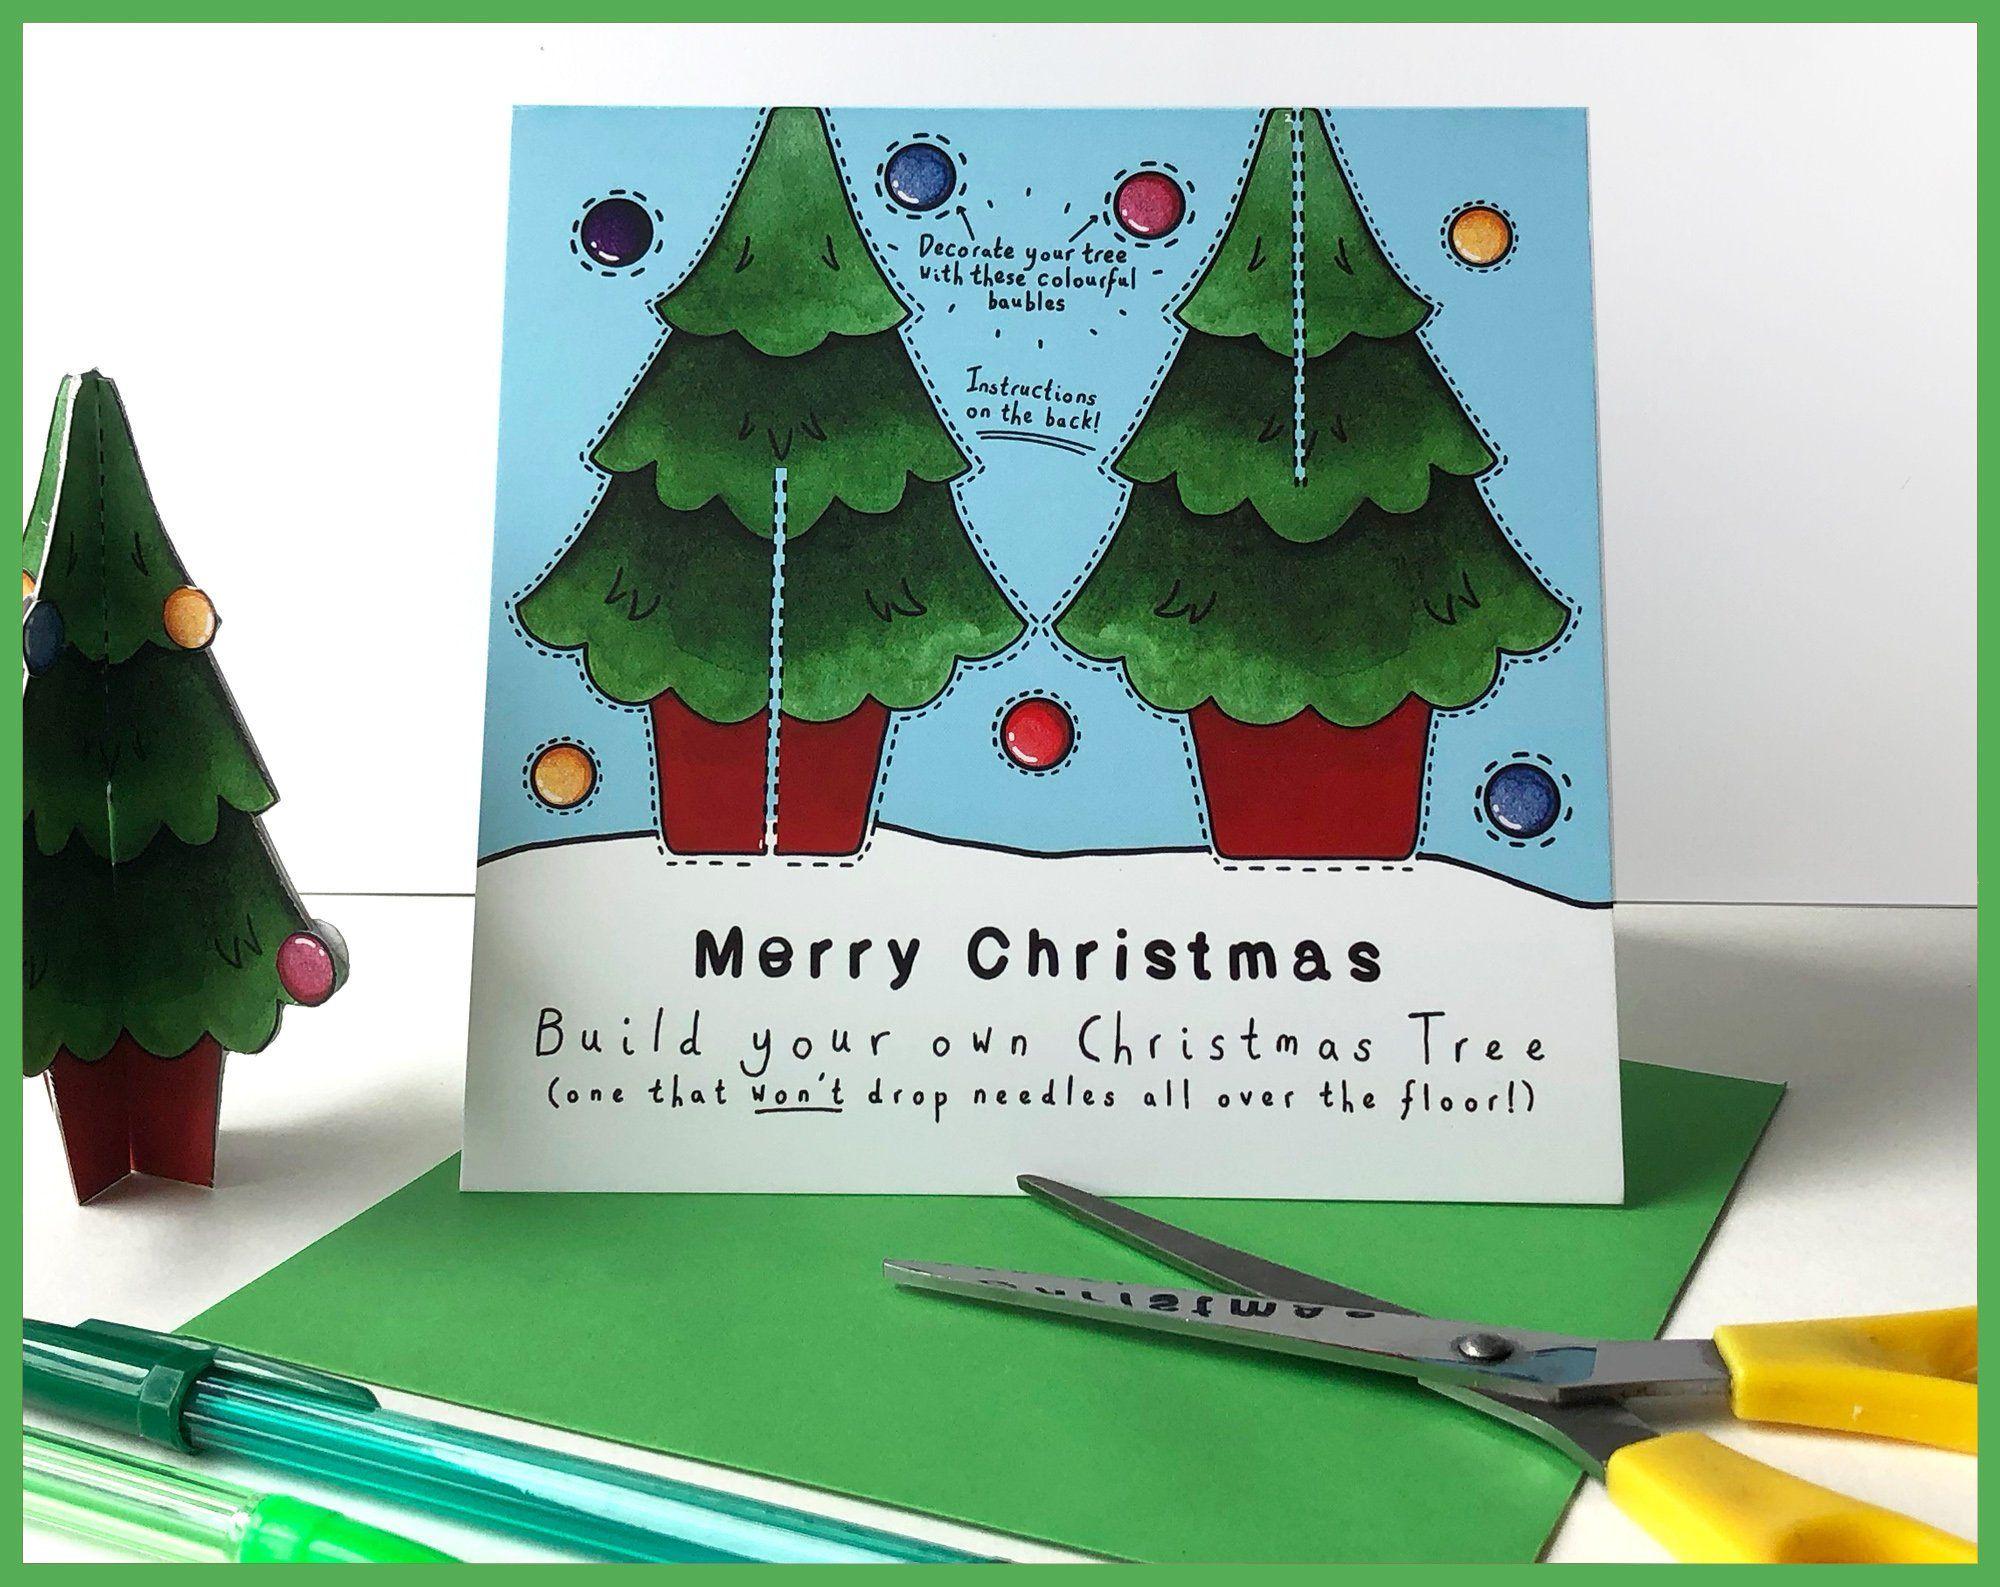 Make Your Own Christmas Tree Card Send More Than A Card Crafting Maker Secret Santa Christmas Cards Xmas C Christmas Tree Cards Christmas Christmas Tree